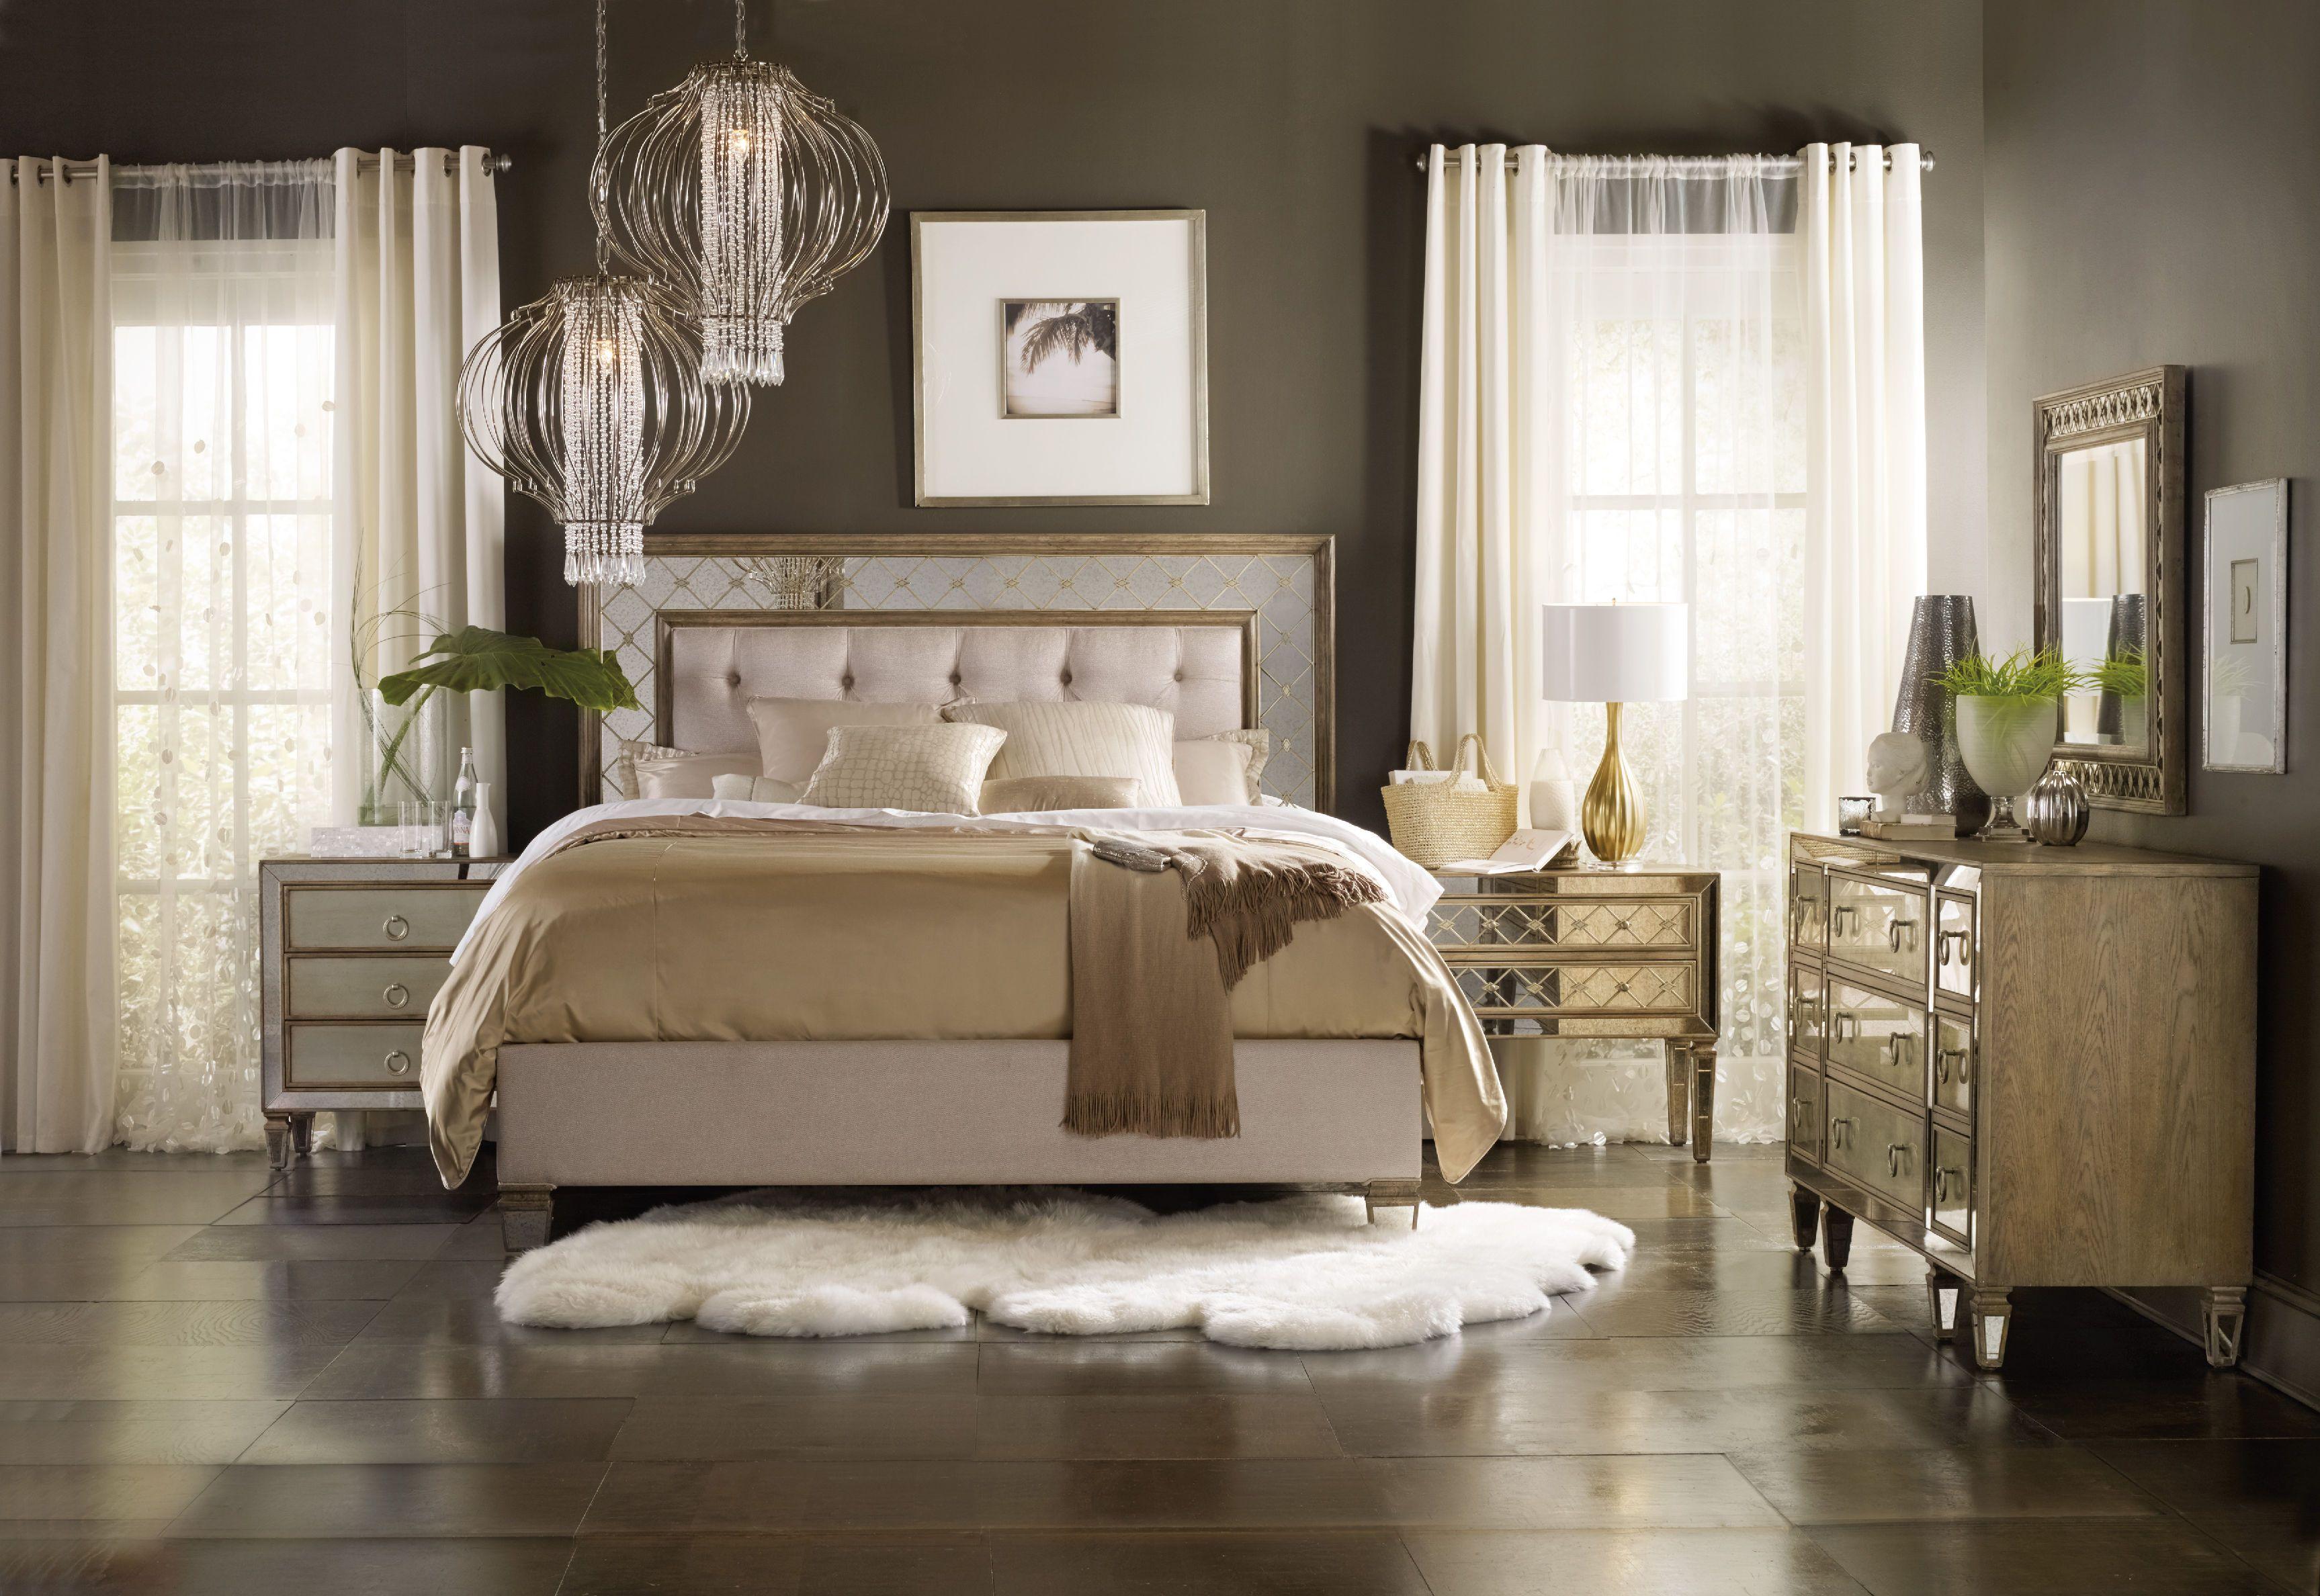 Hooker Furniture Bedroom Sanctuary King Mirrored